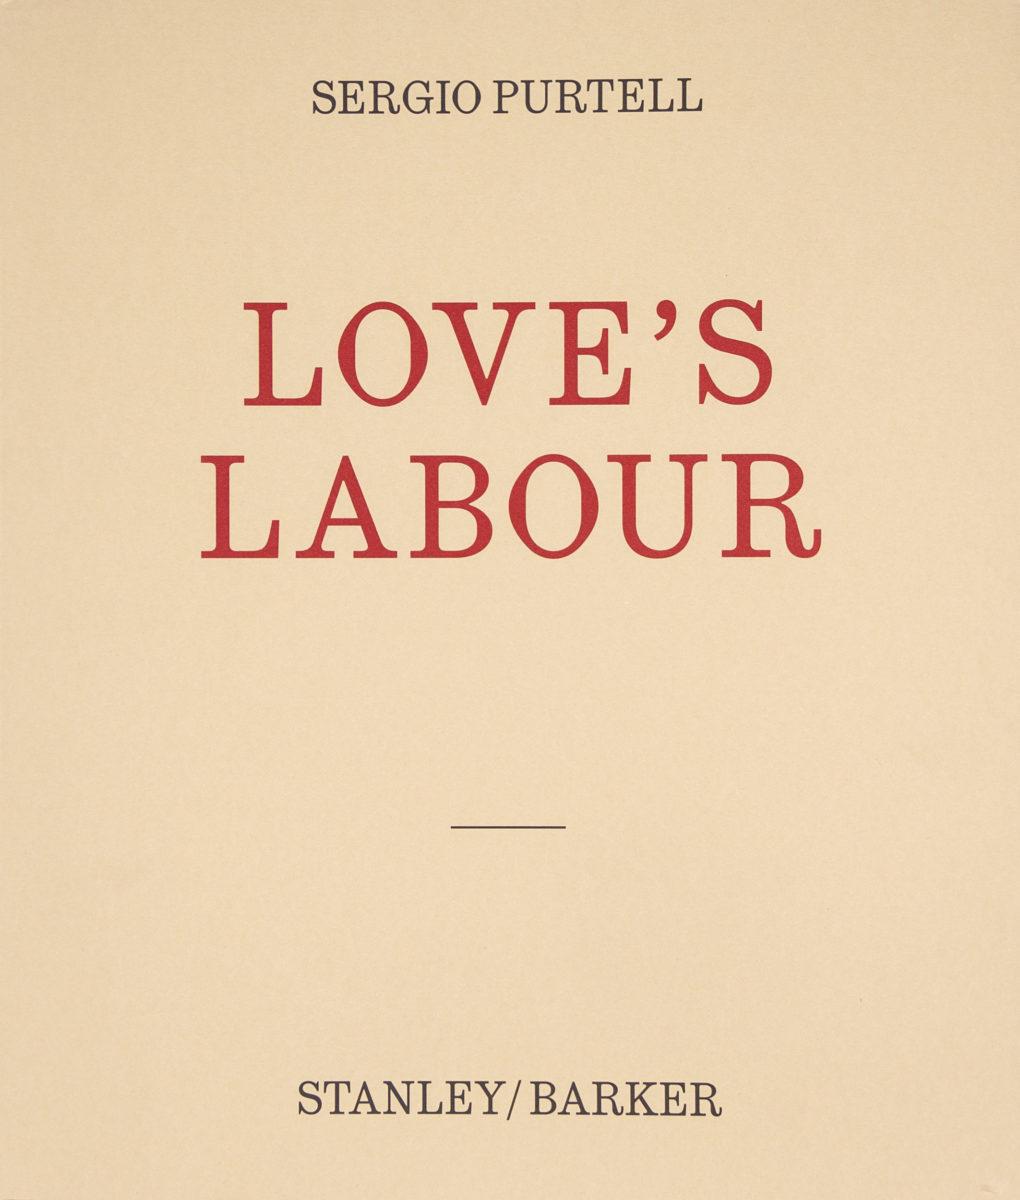 Sergio Purtell, Love's Labour